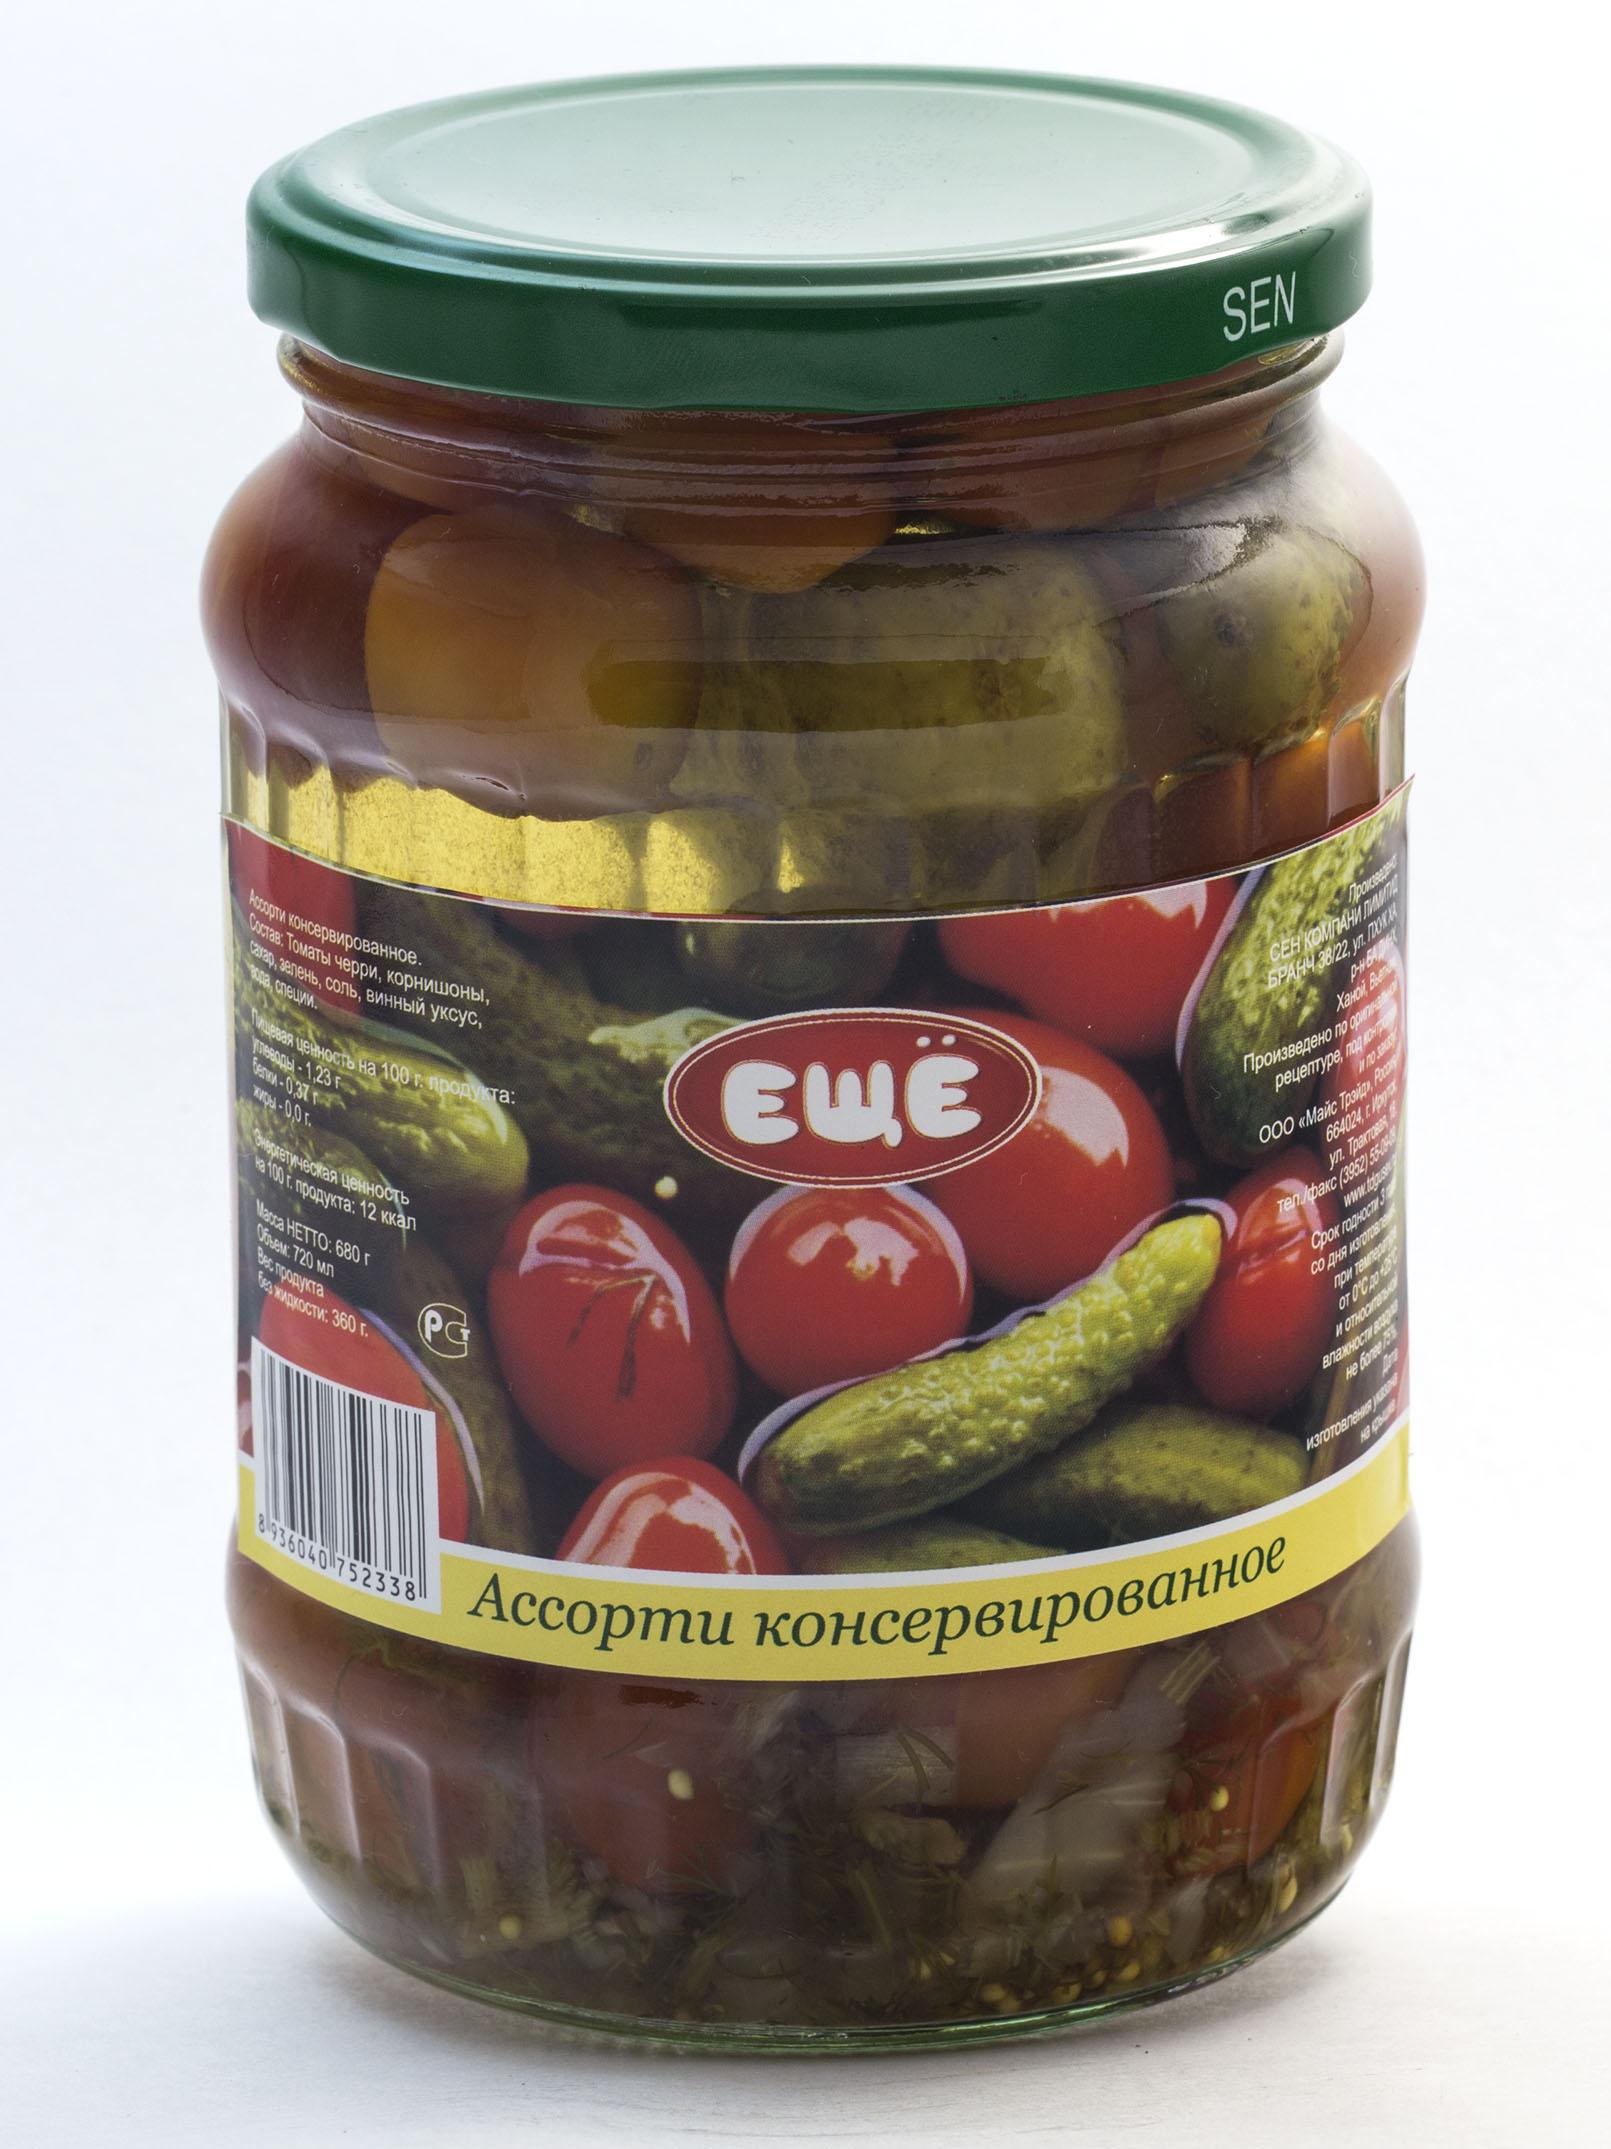 Ассорти (консерв. корнишоны, томаты черри), ст/б, 720 мл.